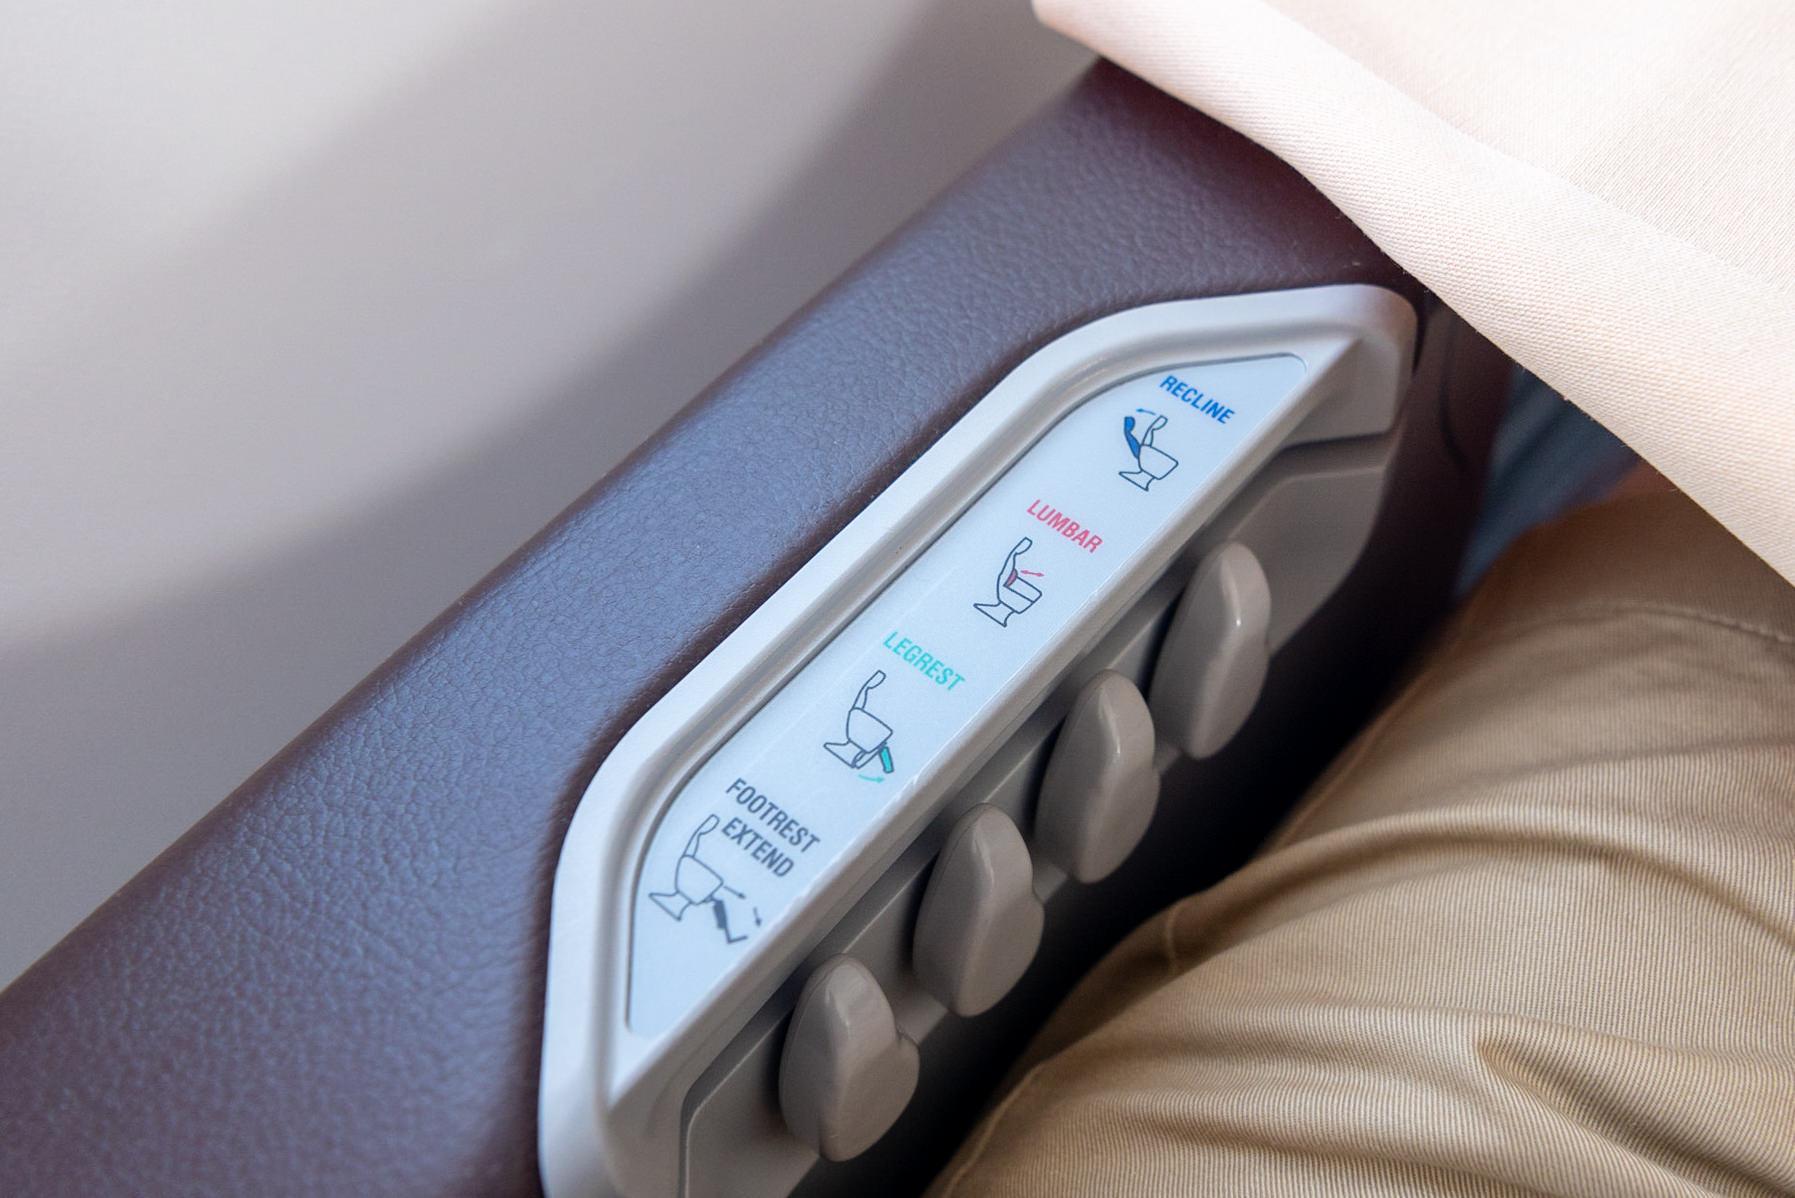 Seat Controls  SilkAir Business Class MI615 737-800 - REP to SIN